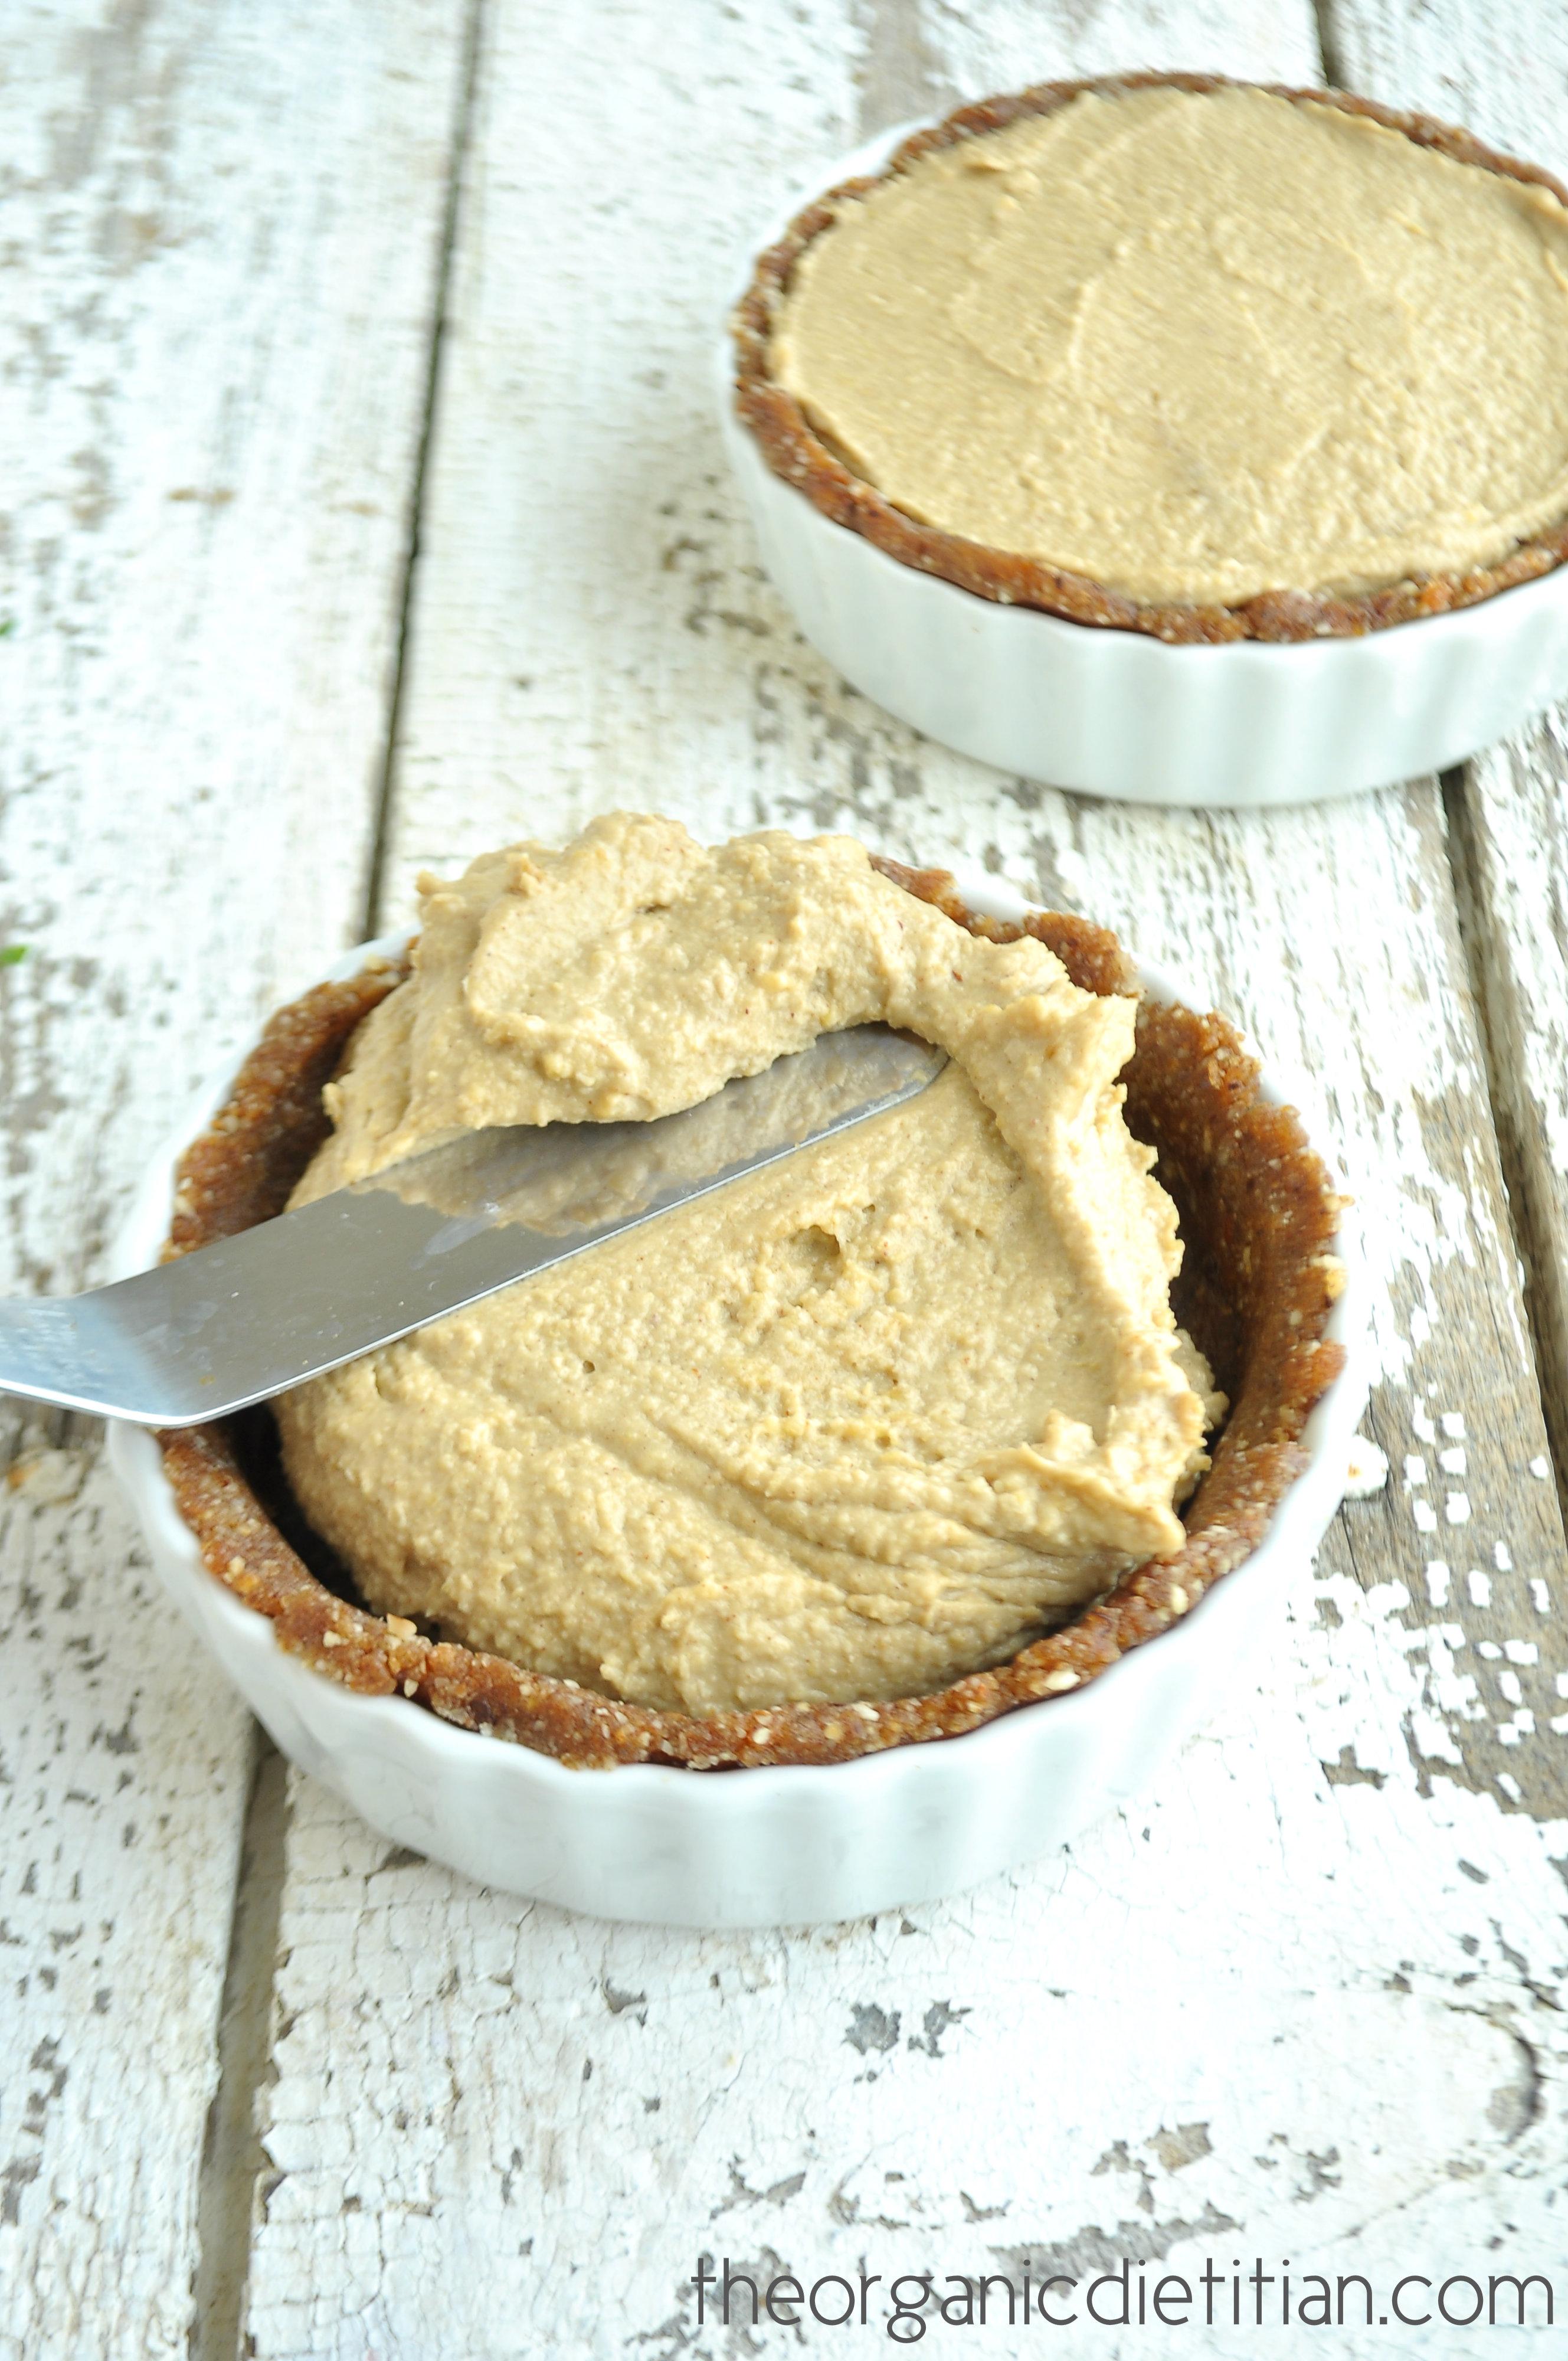 Secretly Healthy Peanut Butter Cup Pie - The Organic Dietitian